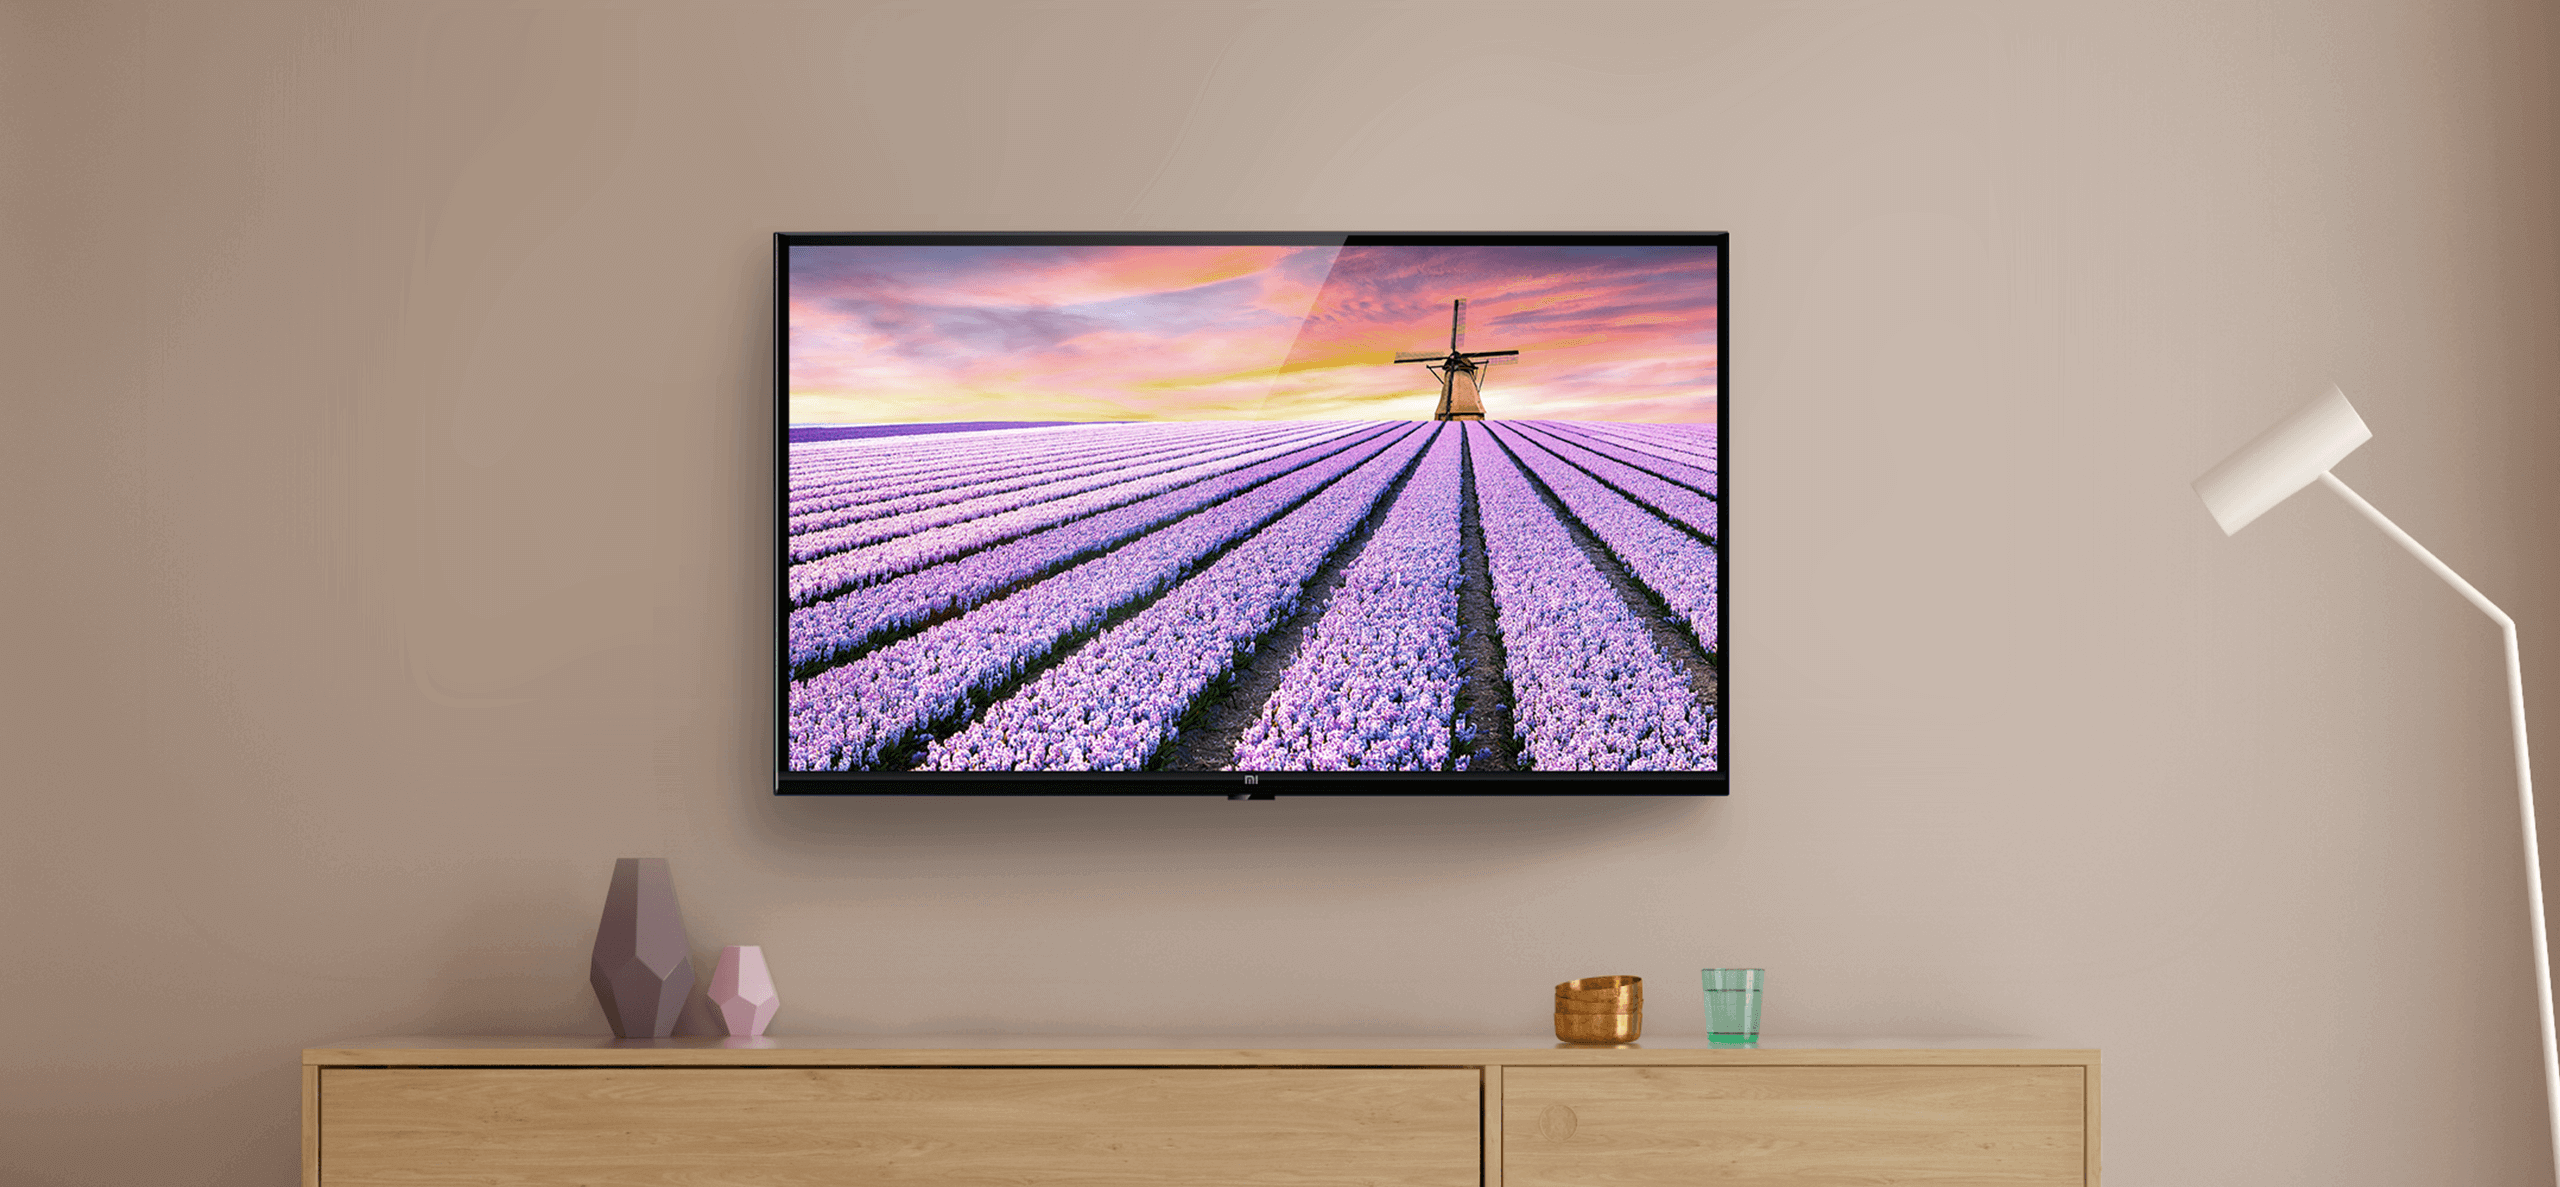 Mi-LED-Smart-TV-4A-43-inch